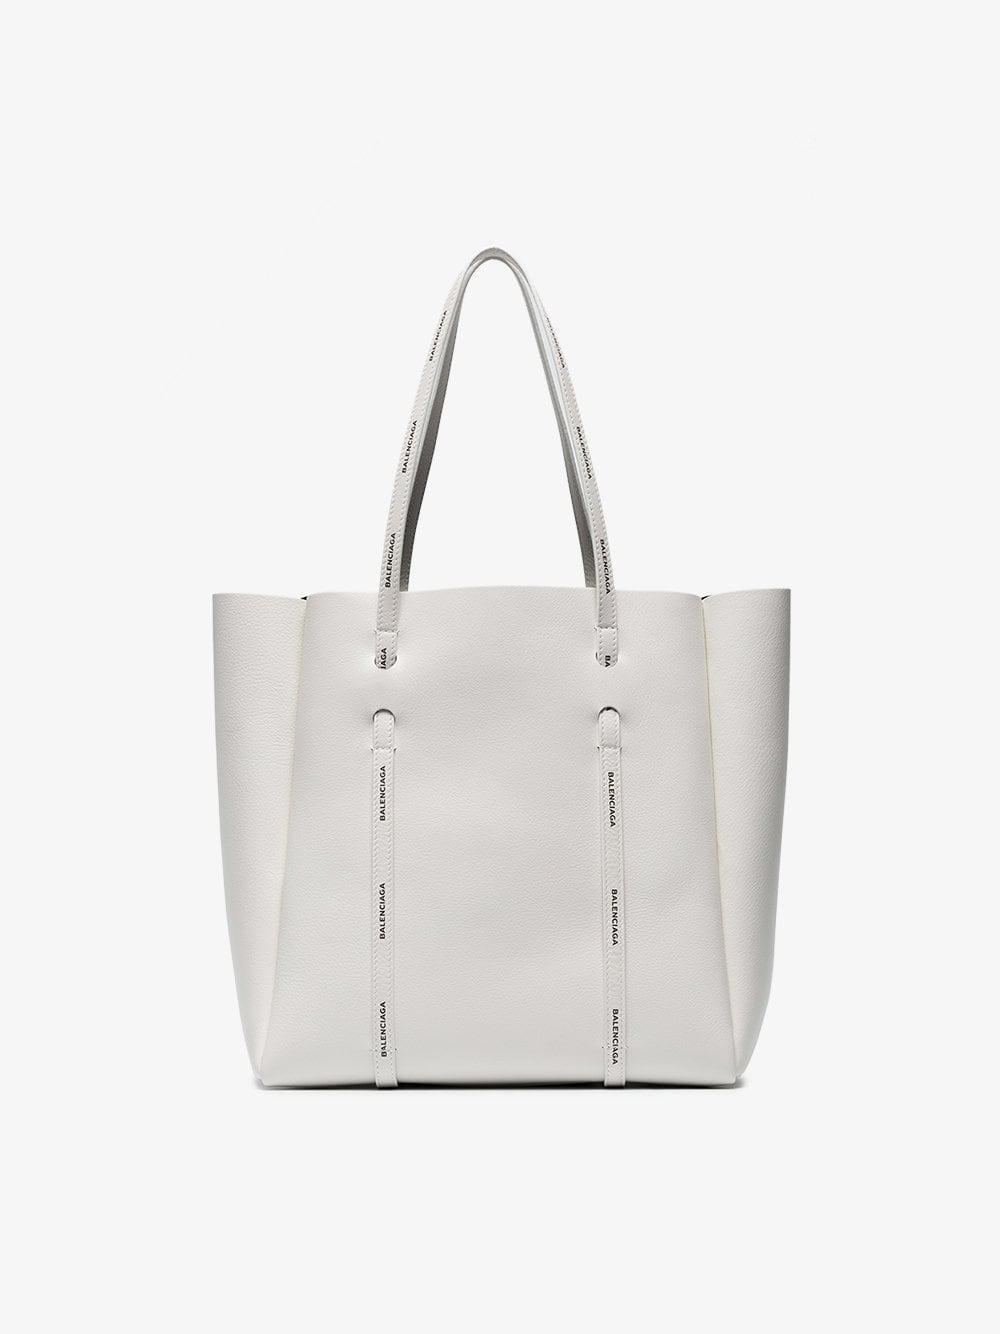 e2db90507c5c Balenciaga - White Everyday Leather Tote - Lyst. View fullscreen